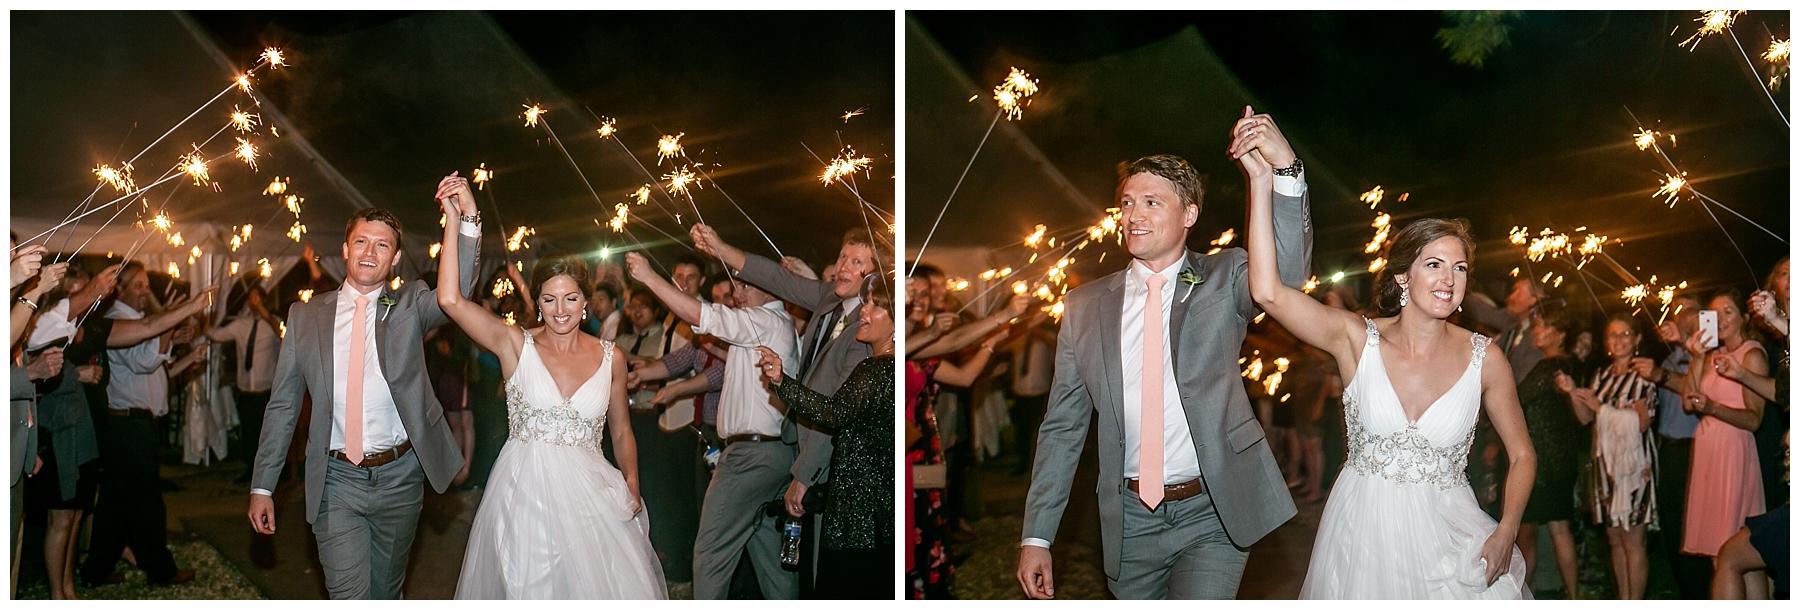 Chelsea Phil Bohemia River Overlook Wedding Living Radiant Photography photos_0214.jpg